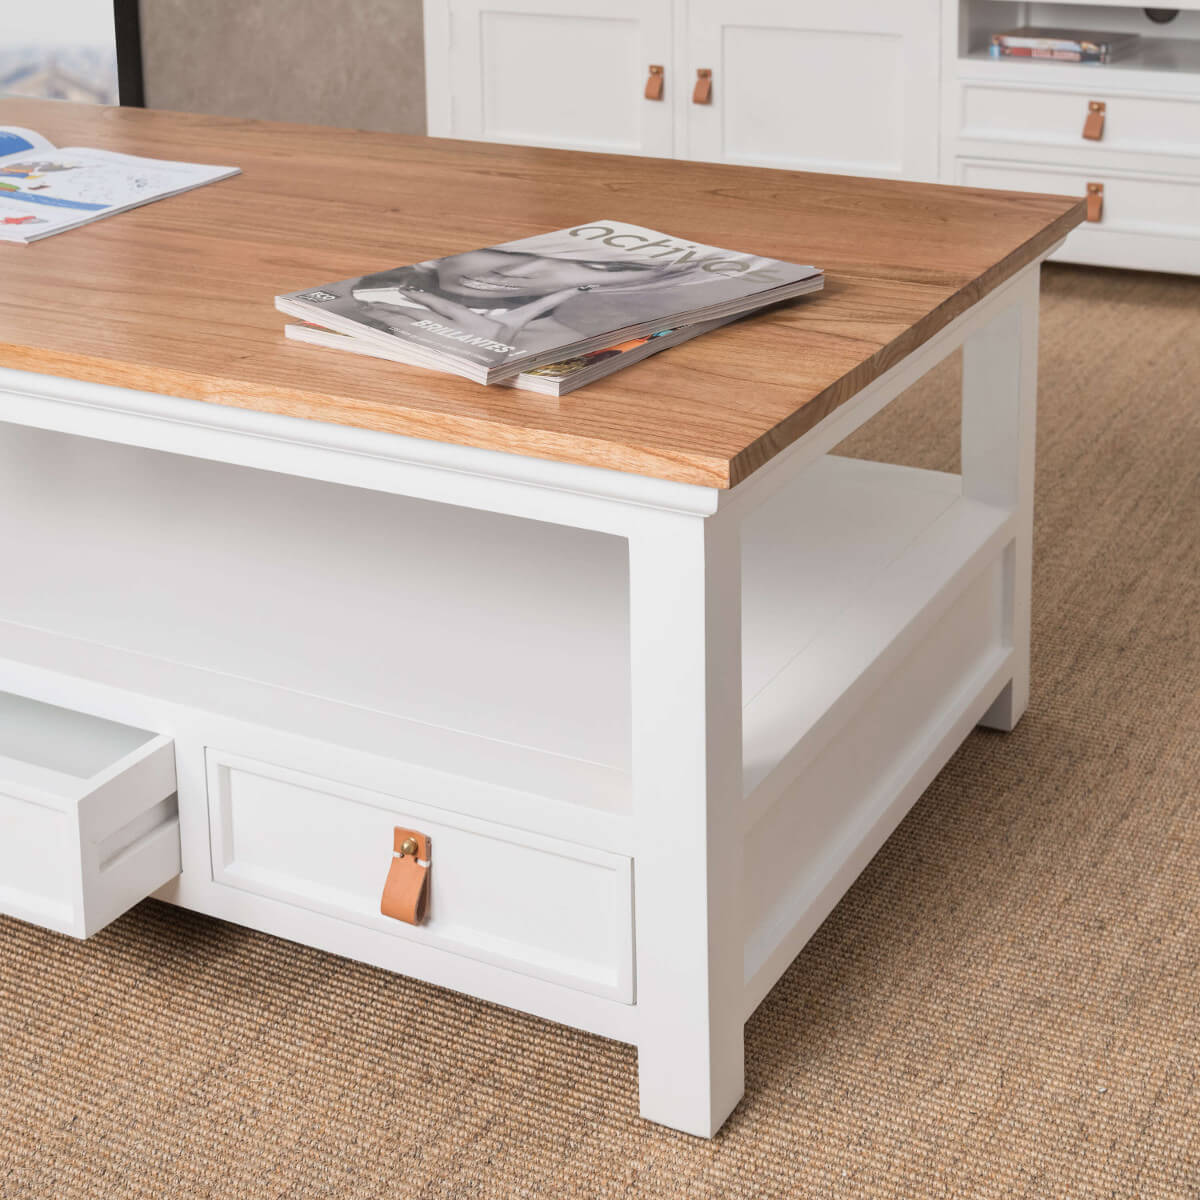 table basse acajou bois massif rectangle blanche chic 120 cm. Black Bedroom Furniture Sets. Home Design Ideas